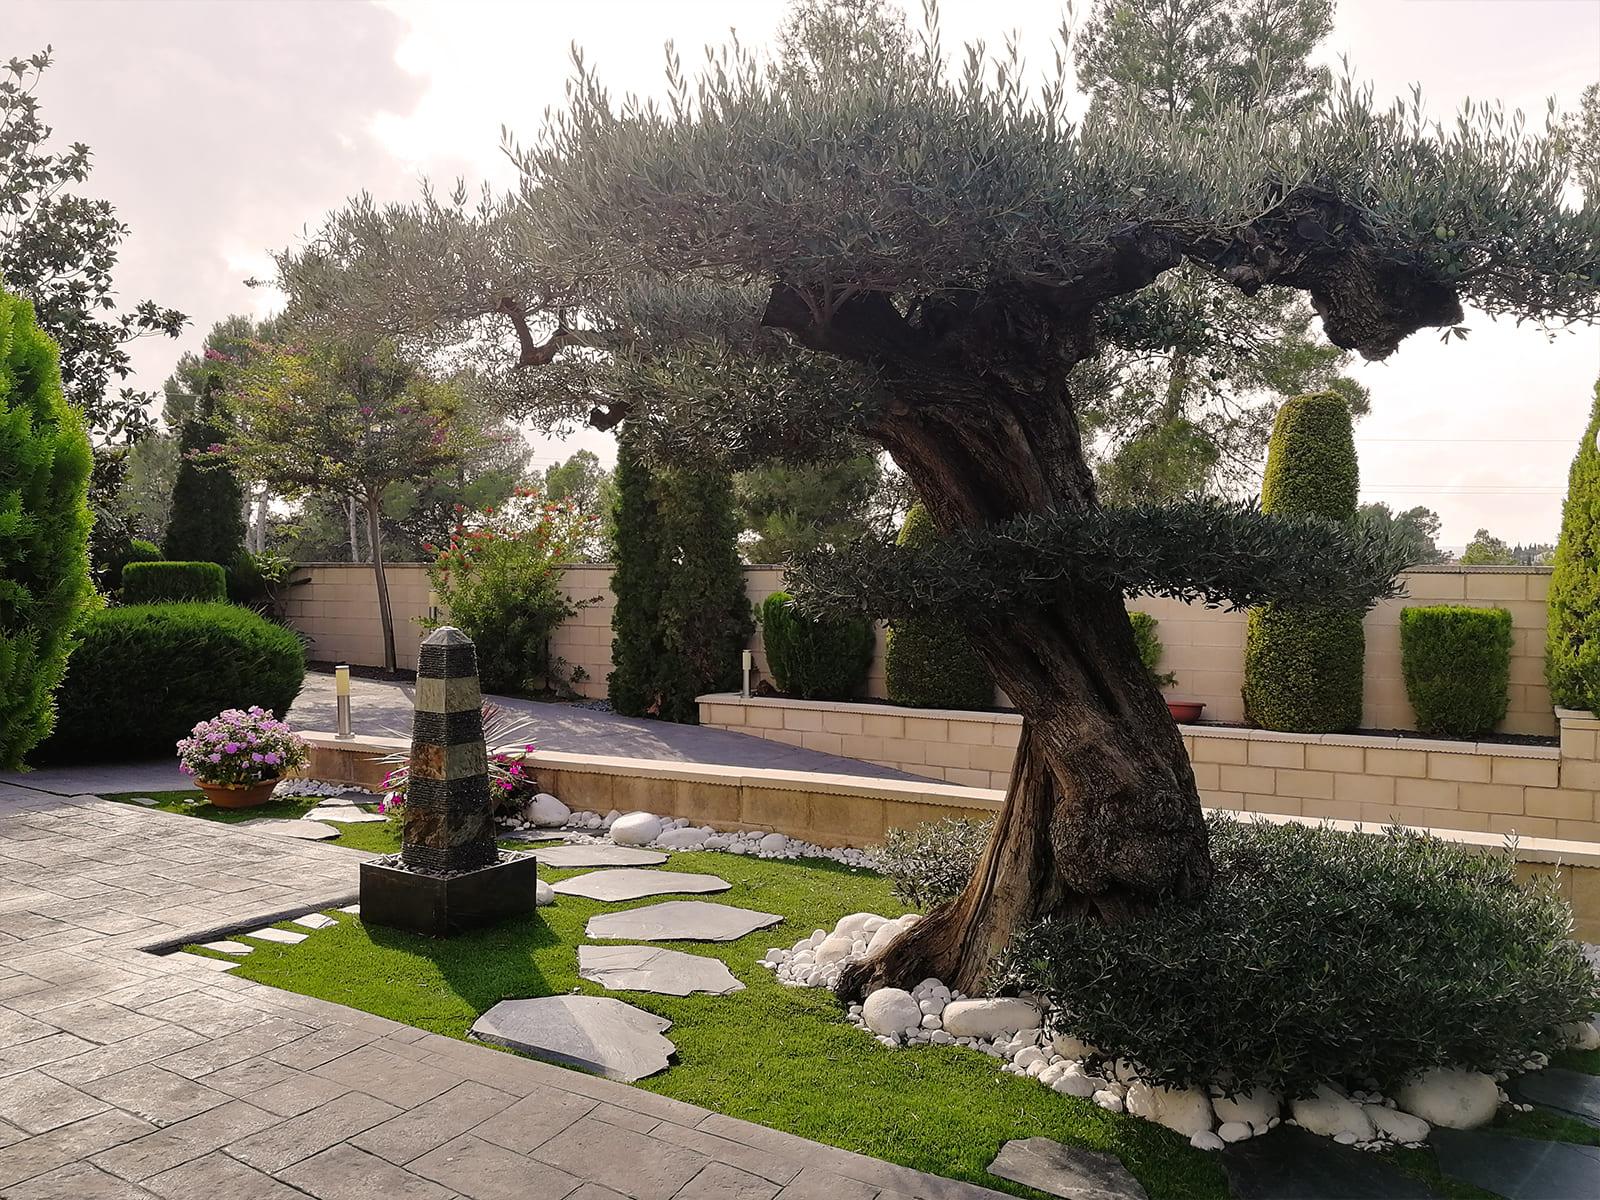 diseño-jardines-espacio-olivo-MM-02_HIDROJARDIN-Bañeres